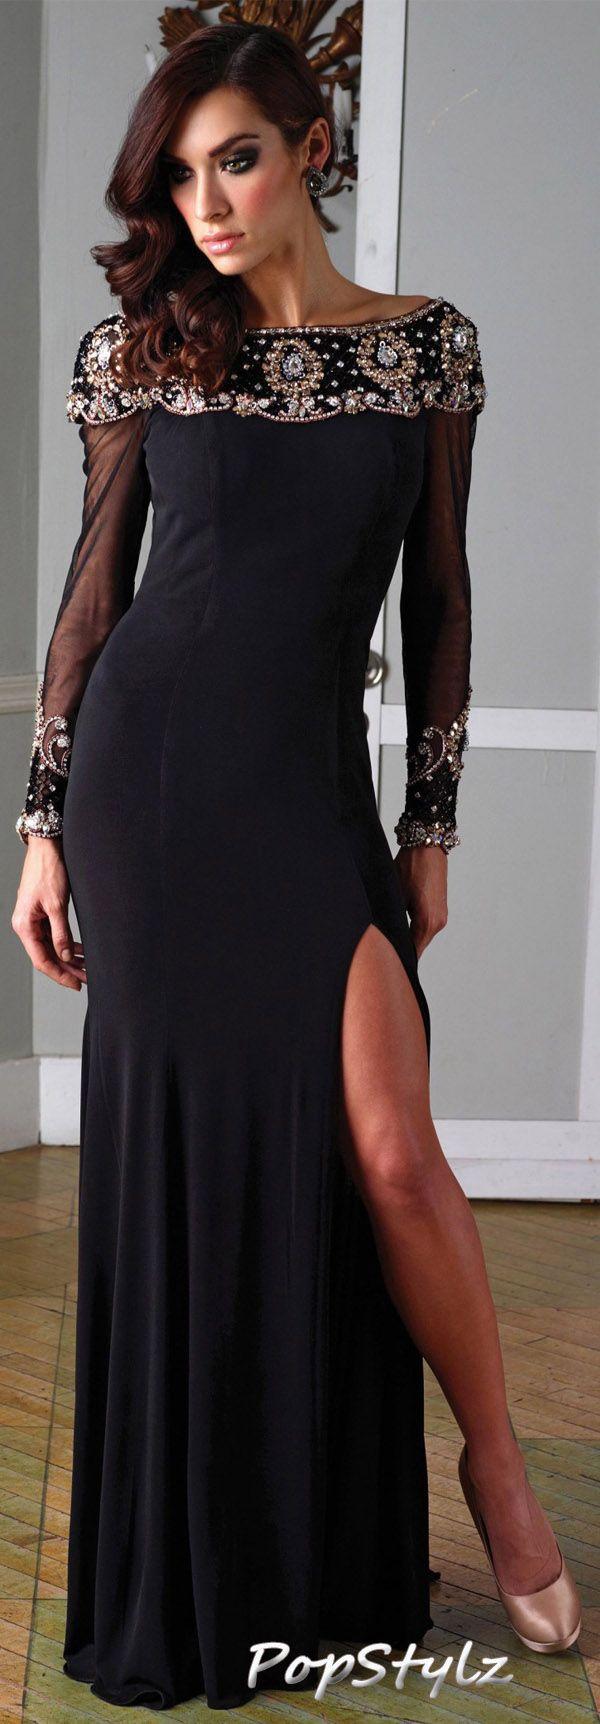 Black prom dress black prom dress black prom dress my favorite